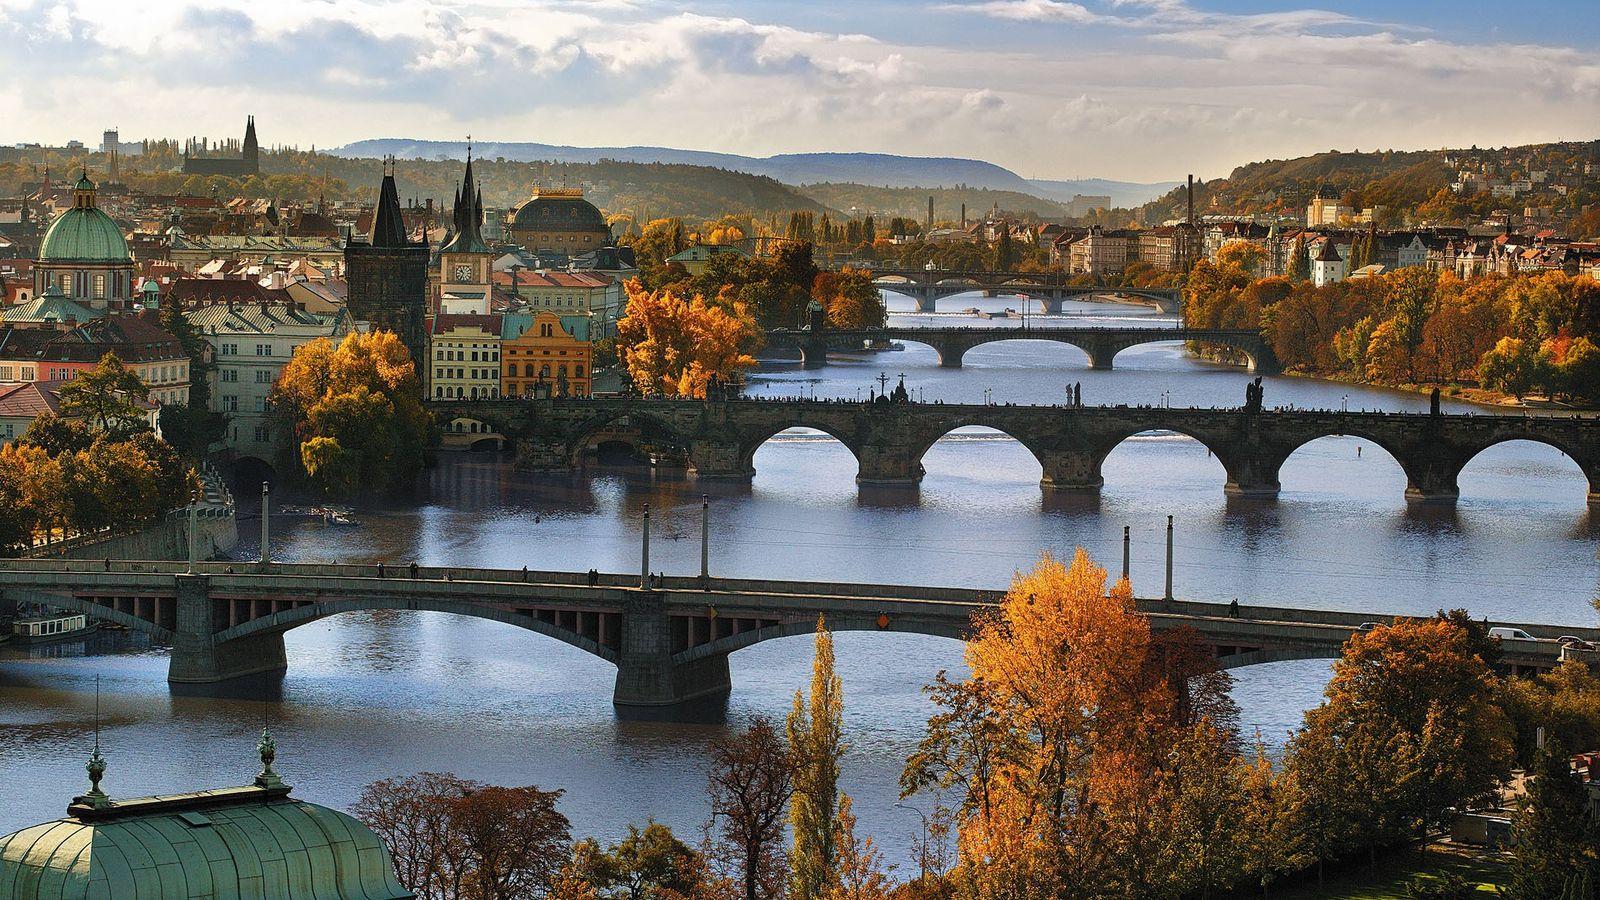 Bridges over the Vltava river, the longest in the Czech Republic.